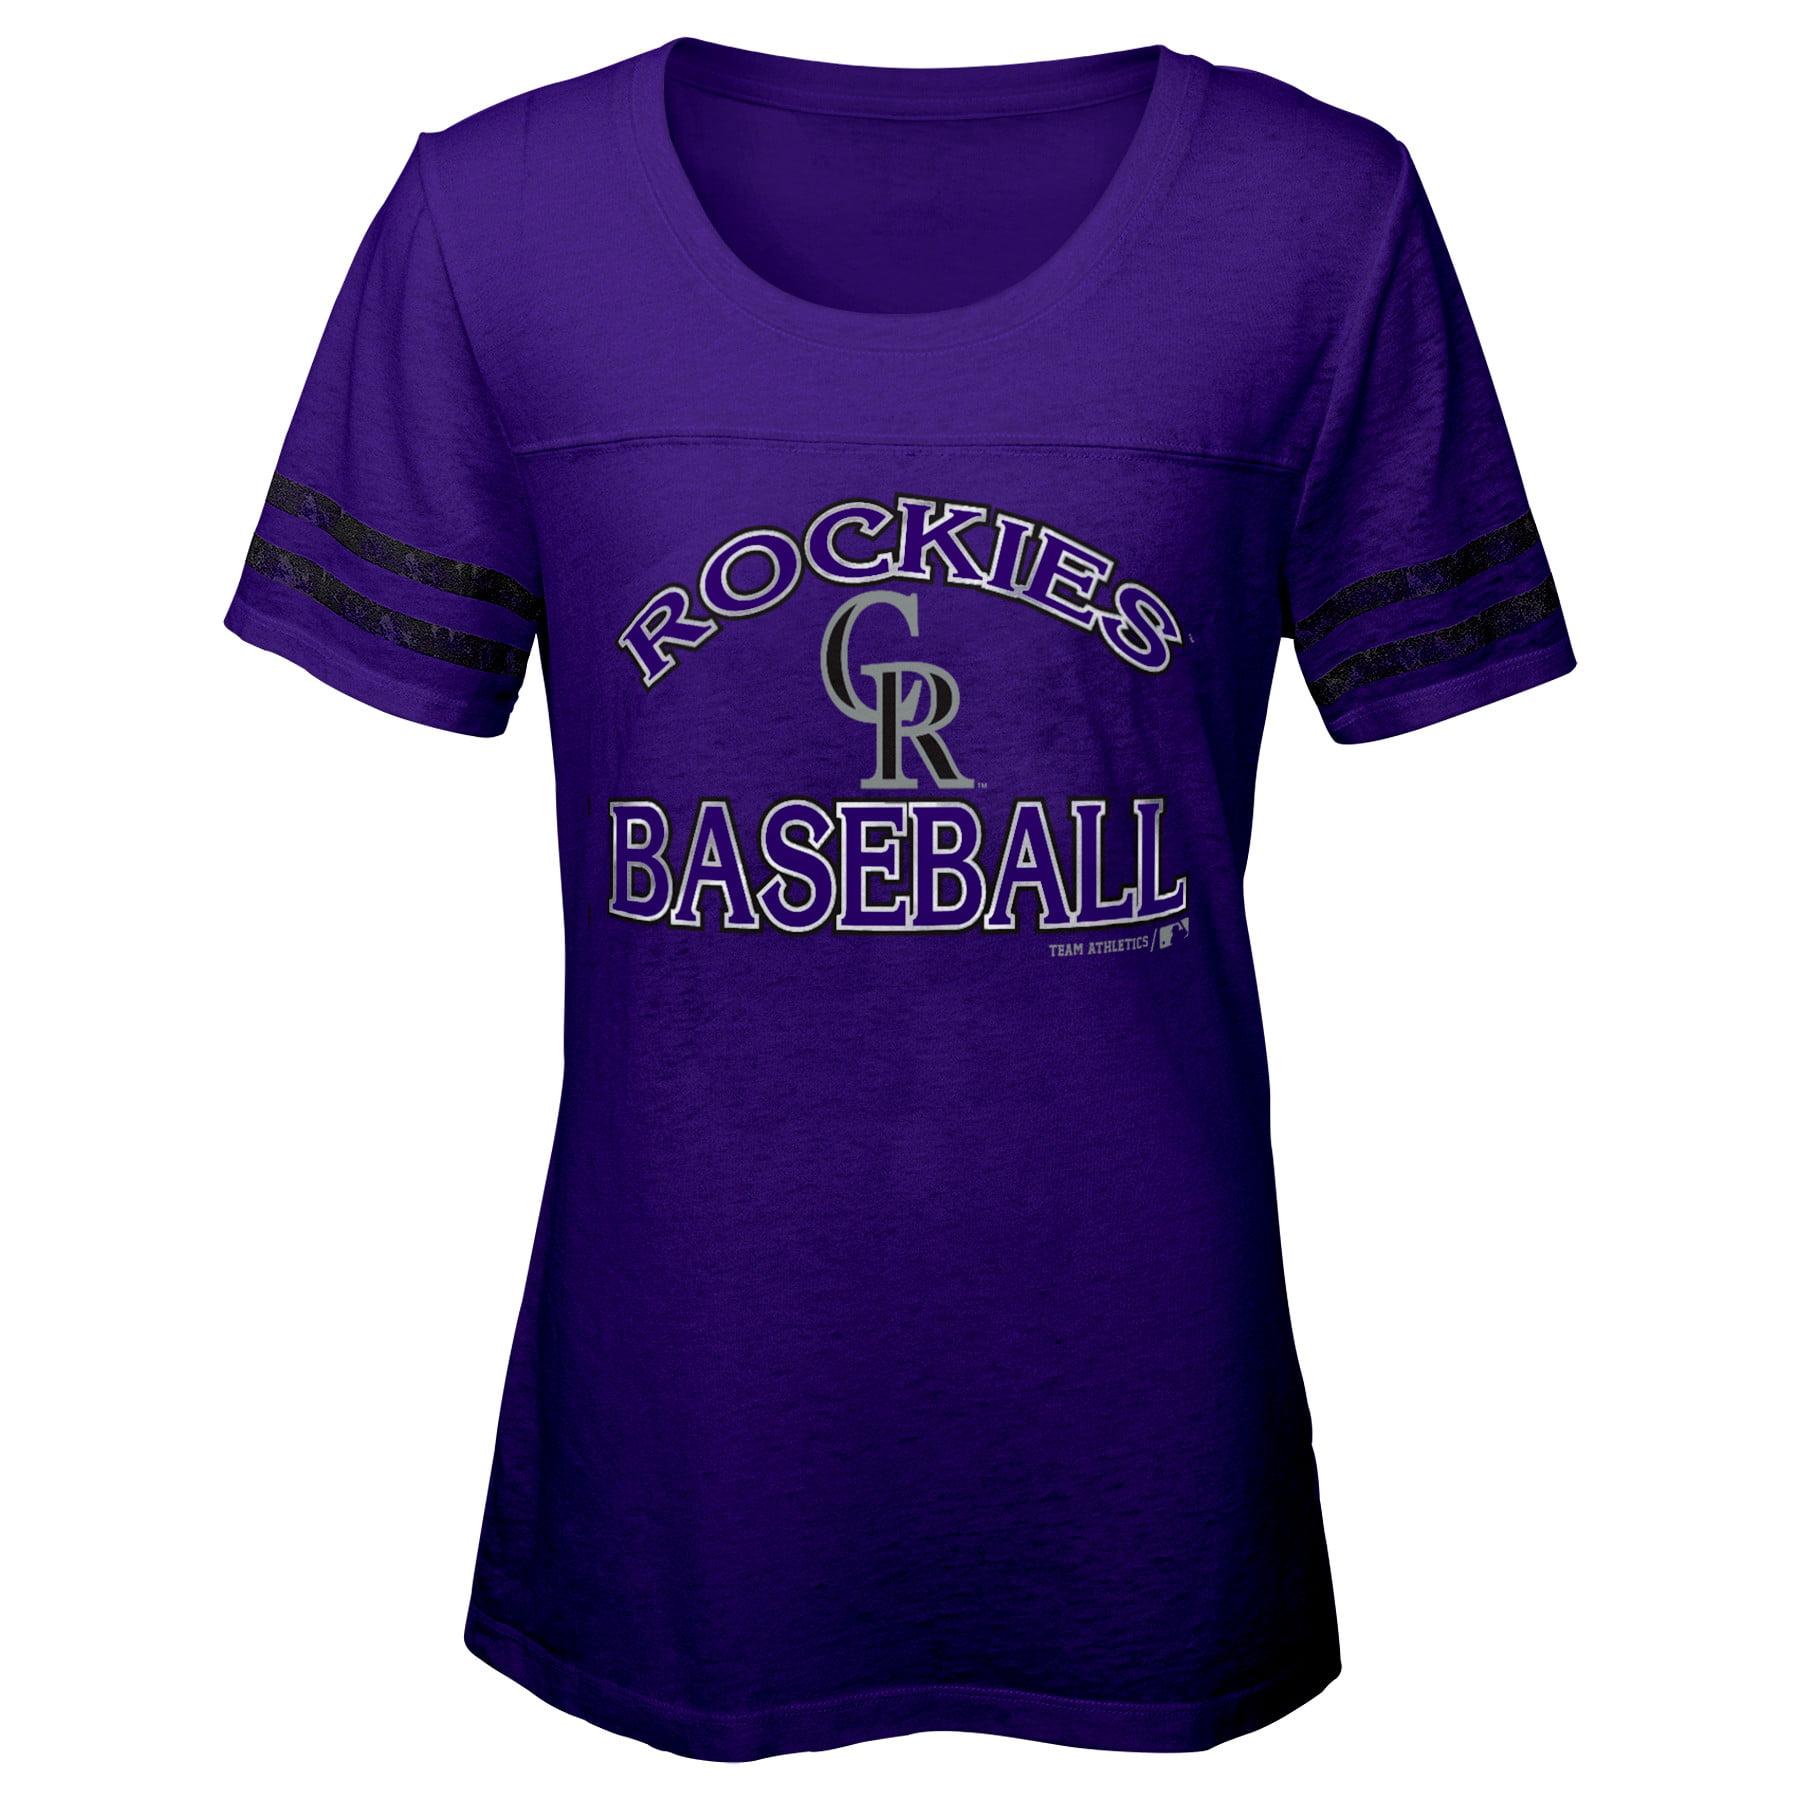 MLB COLORADO ROCKIES TEE Short Sleeve Girls Fashion 60% Cotton 40% Polyester Alternate Team Colors 7 - 16